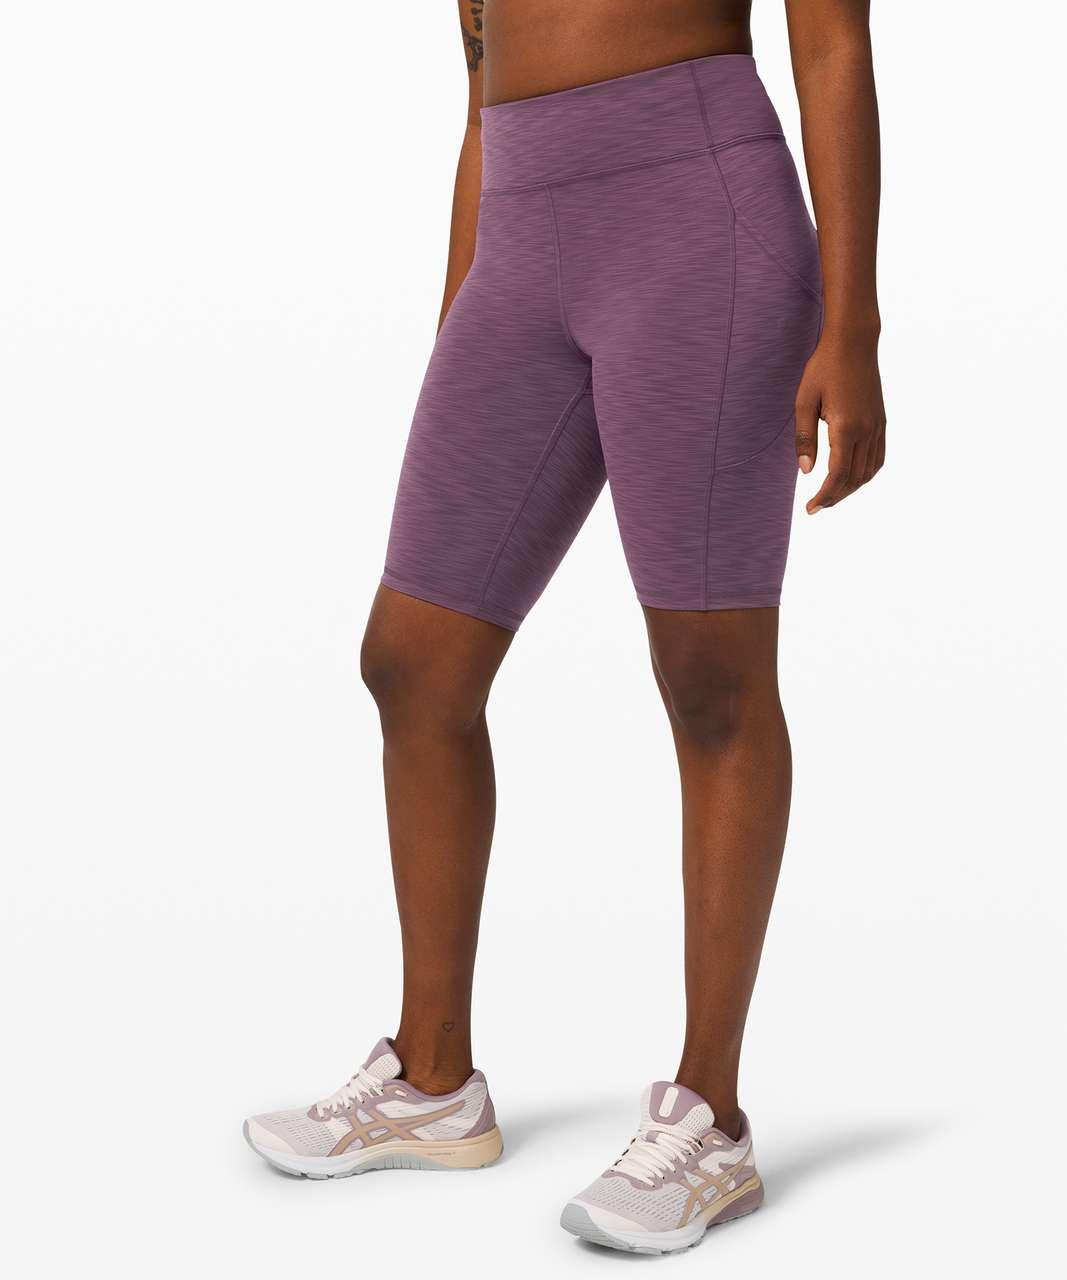 "Lululemon Invigorate High-Rise Short 10"" - Heathered Black Currant"